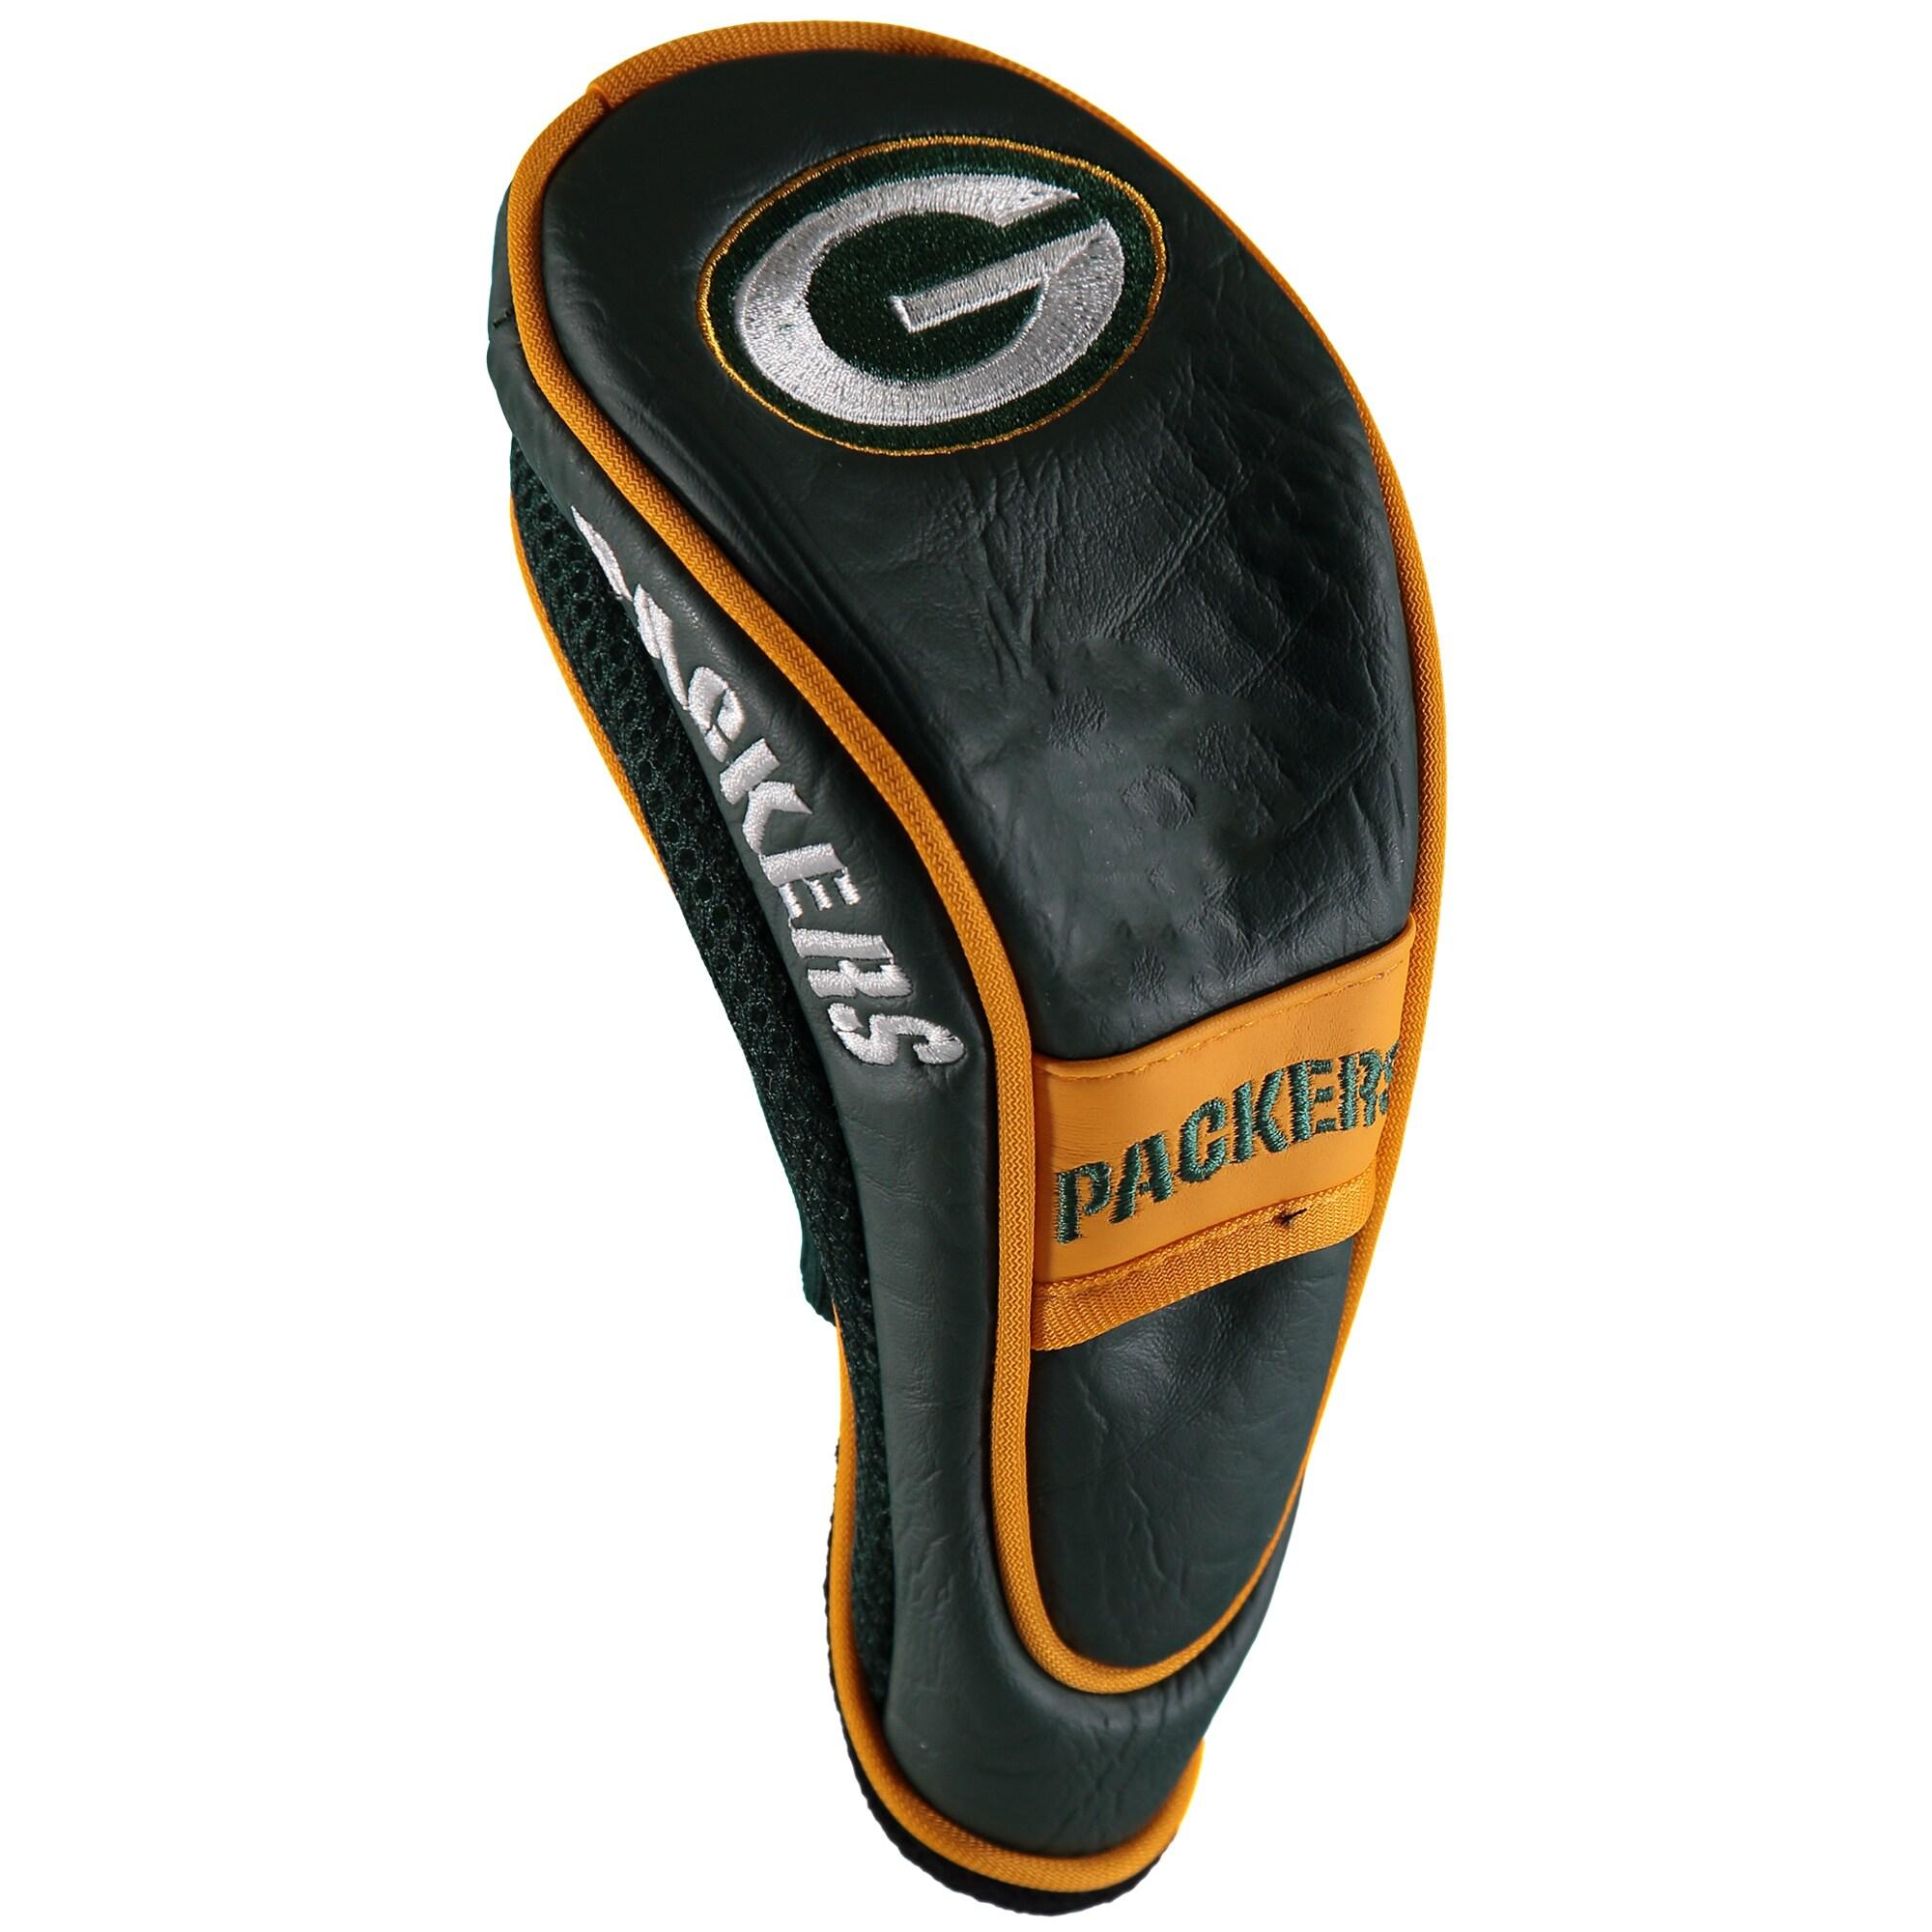 Green Bay Packers Hybrid Golf Club Head Cover